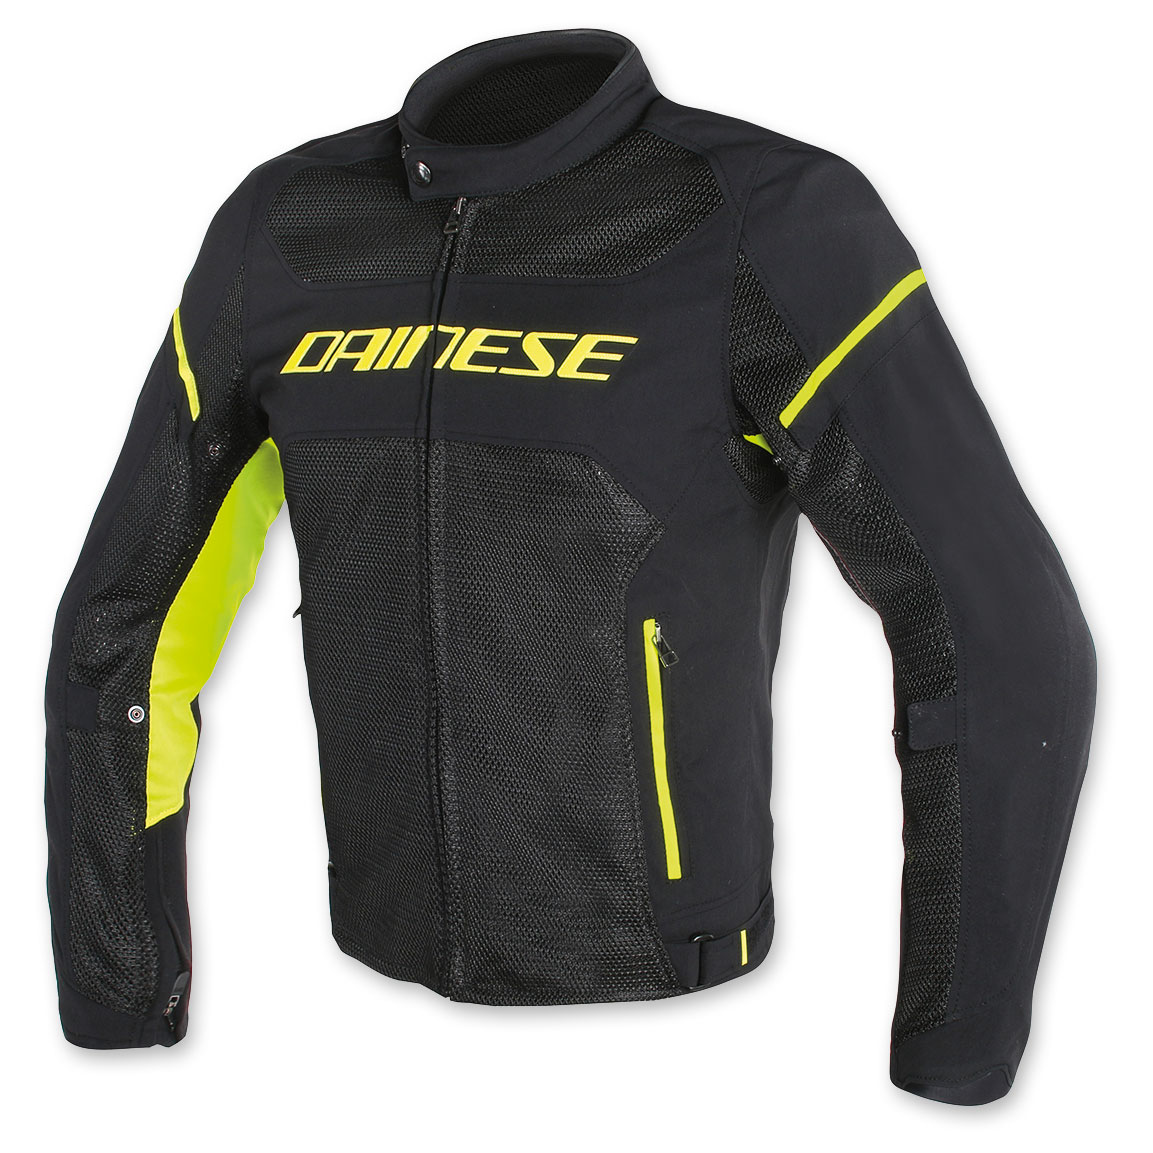 Dainese Men's Air Frame D1 Black/Black/Yellow-Fluo Jacket